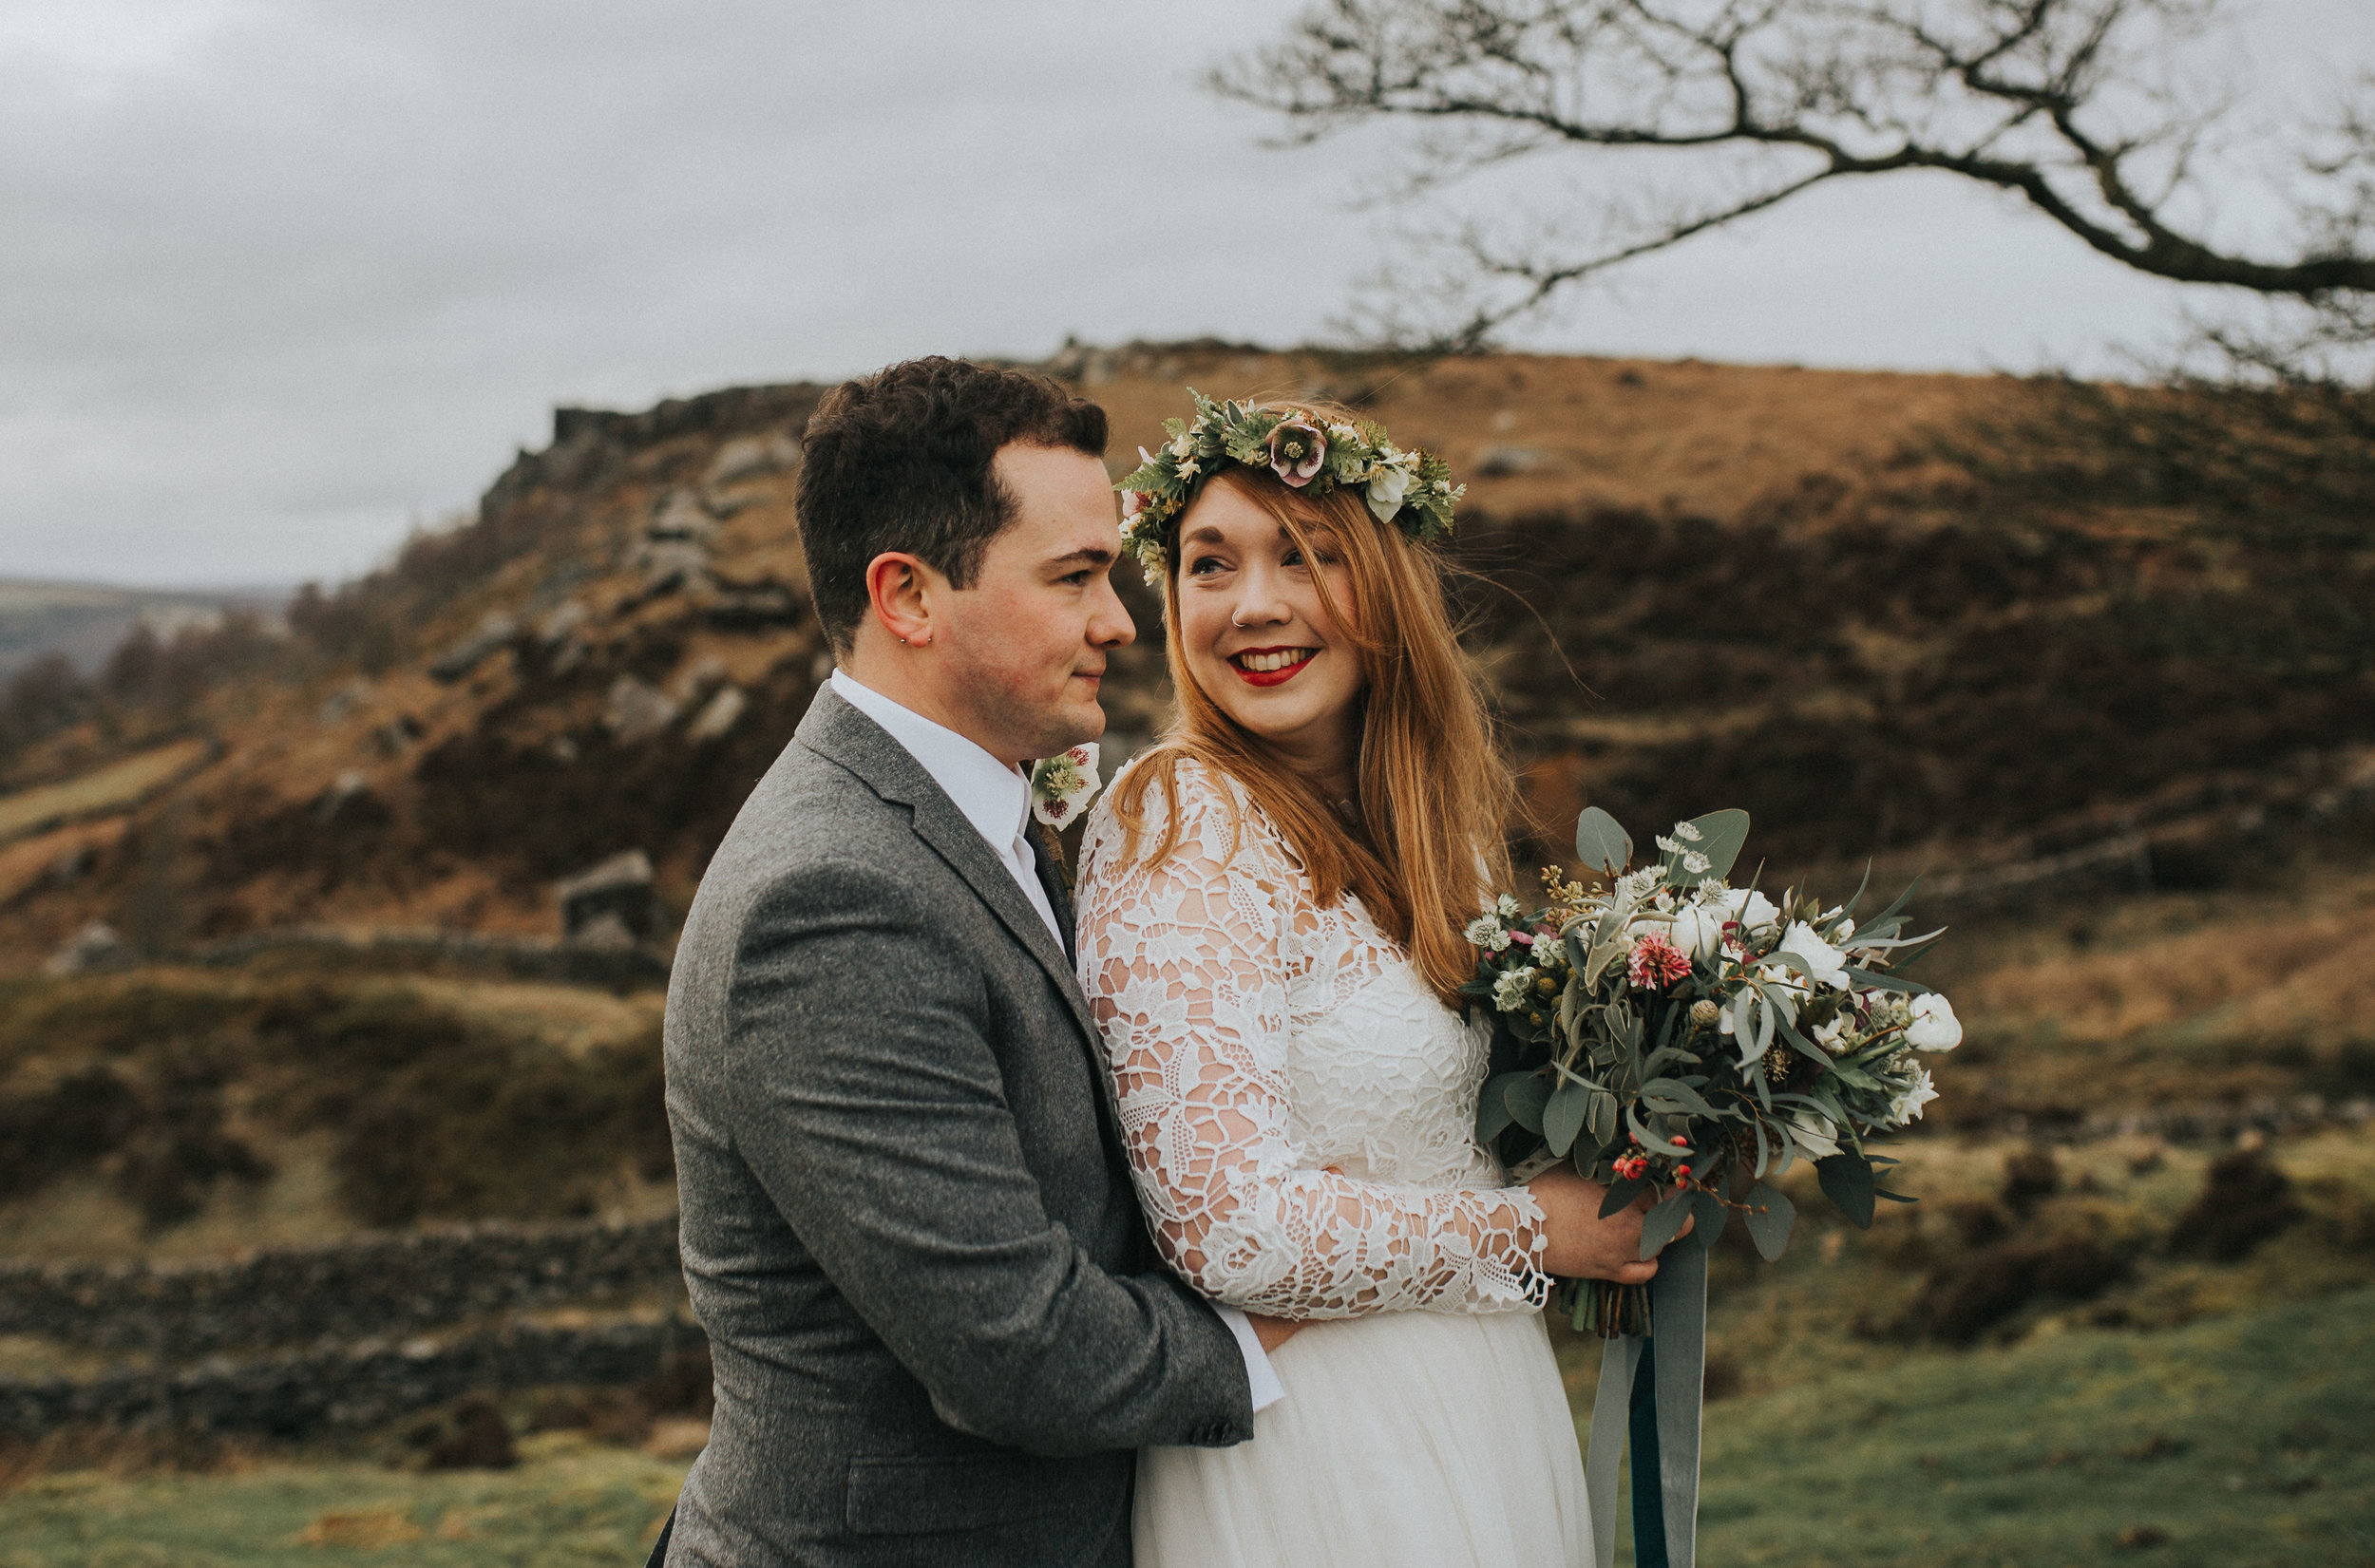 Rosie-bespoke-lace-long sleeved-tulle-wedding-dress-winter-peak district-susanna greening-2.jpg